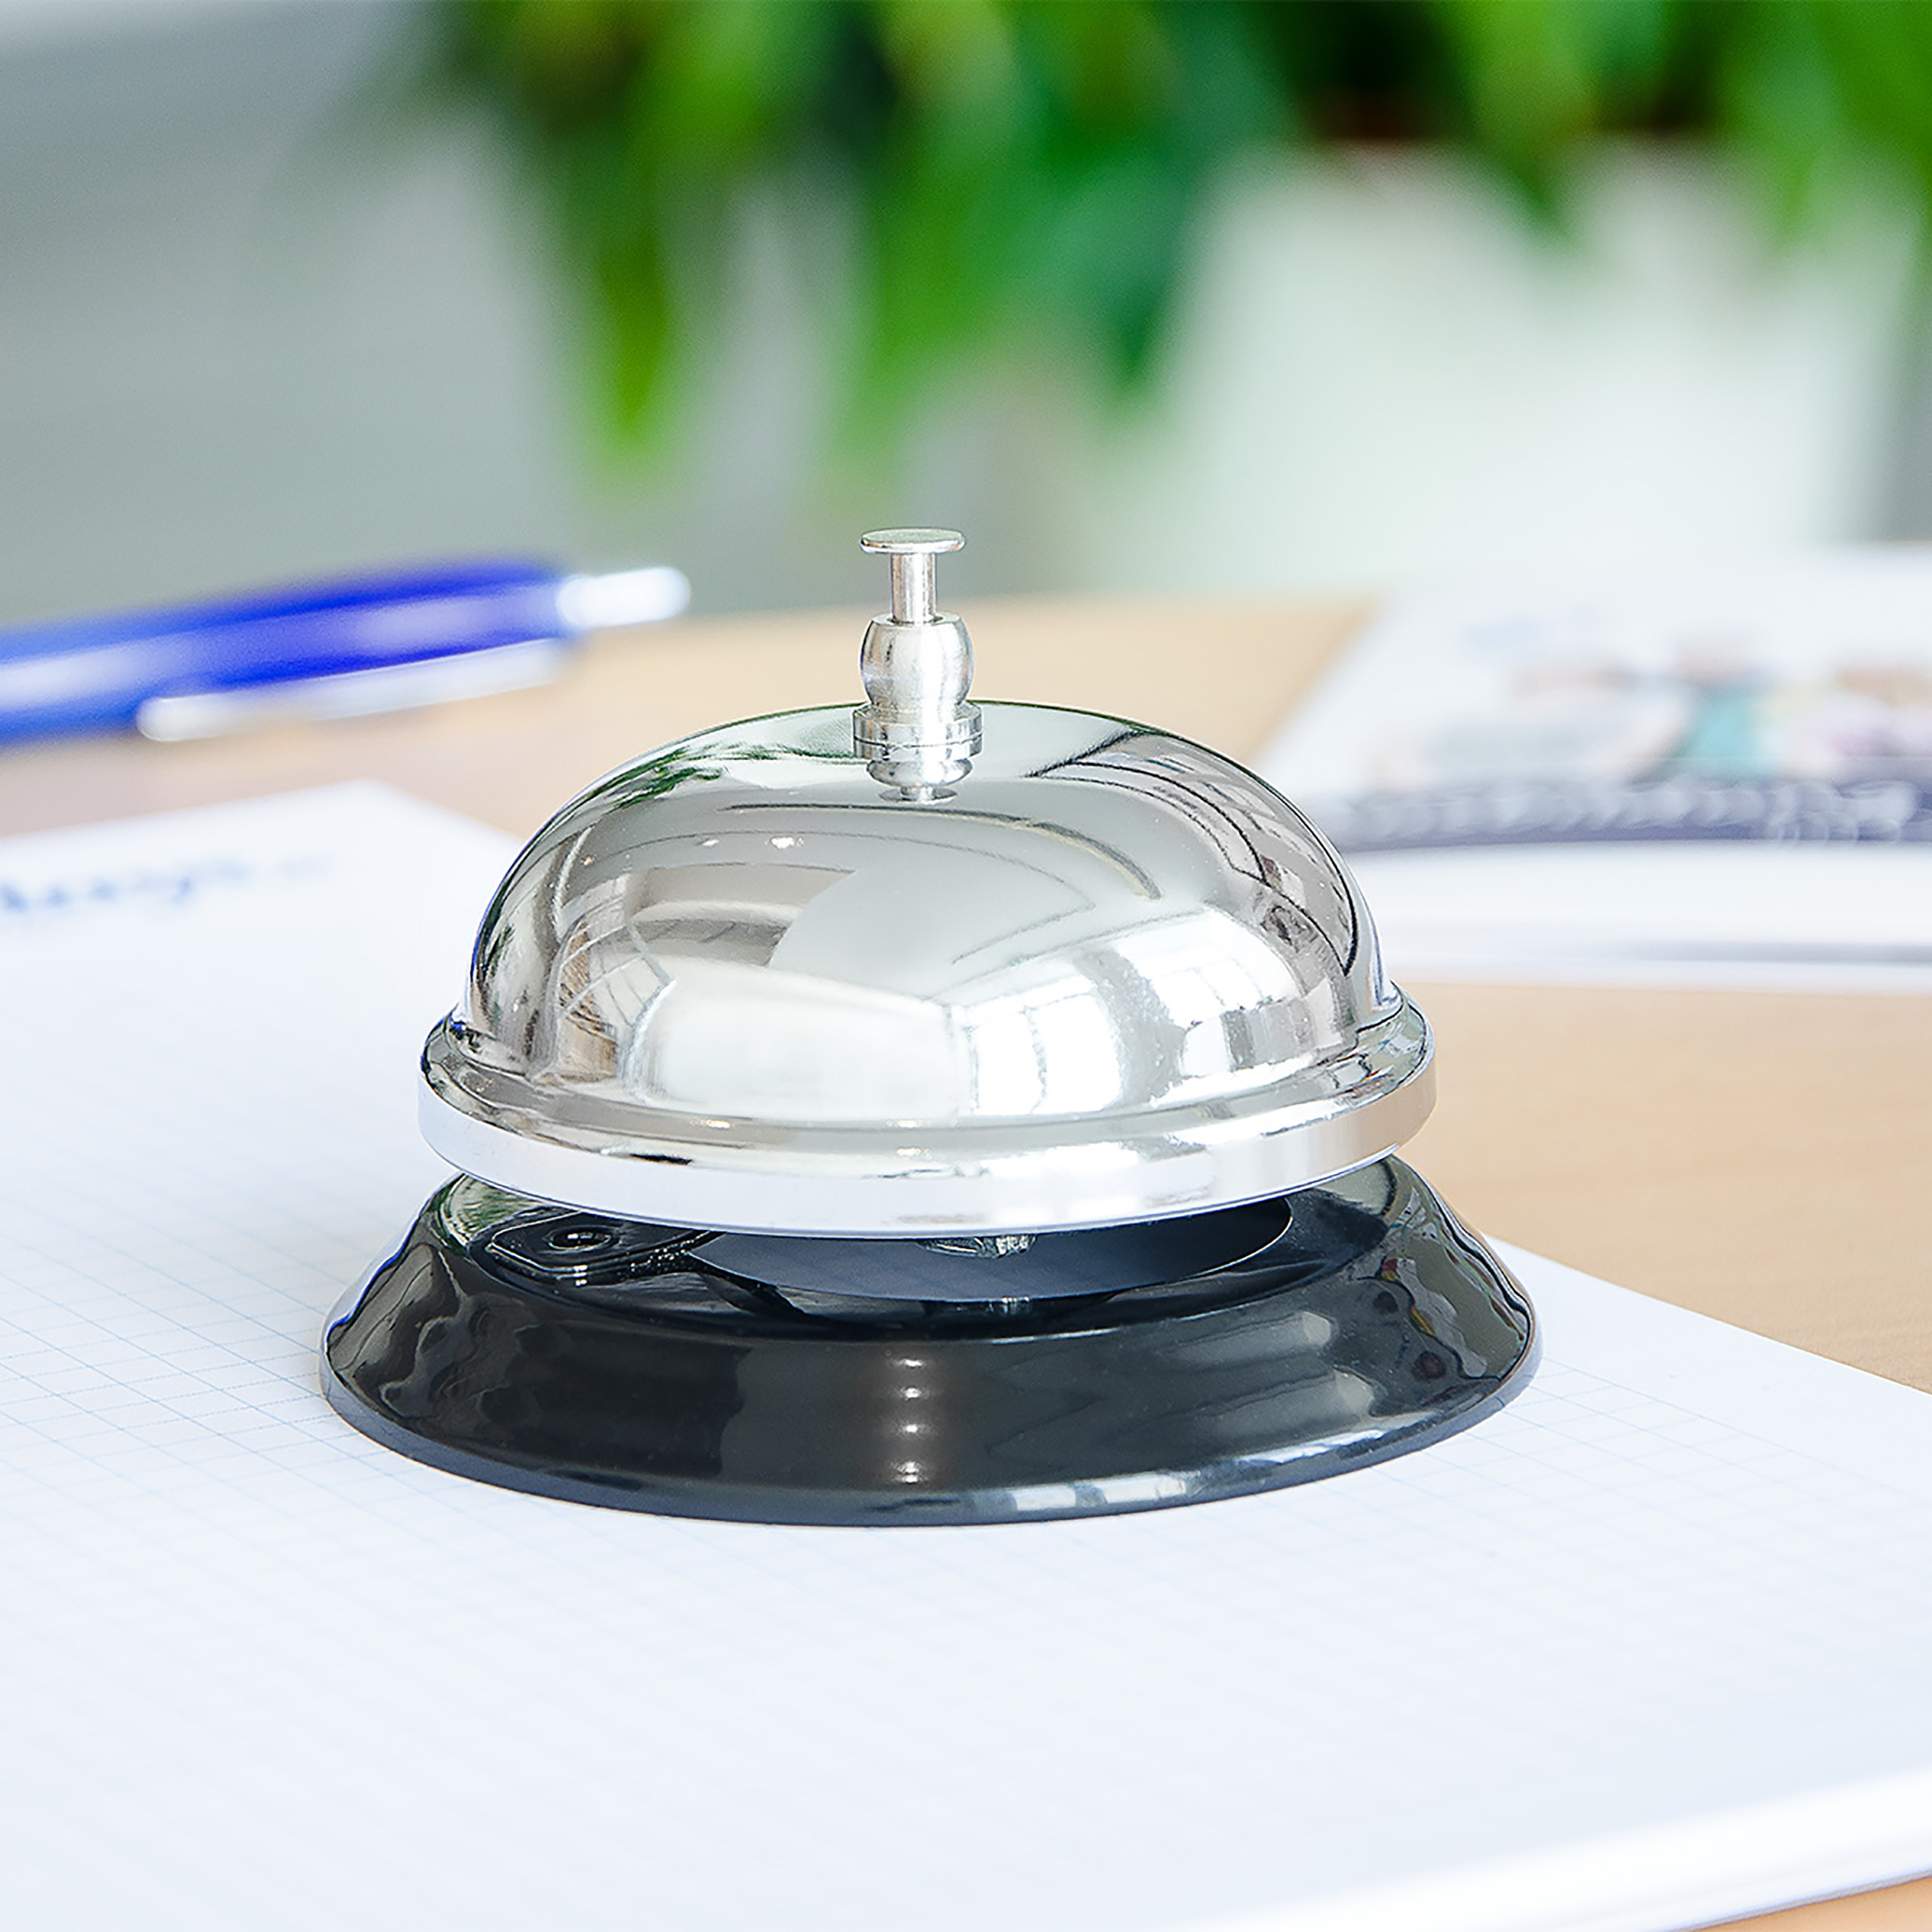 Tischklingel rezeptionsklingel serviceklingel hotelklingel mesa campana campana 86